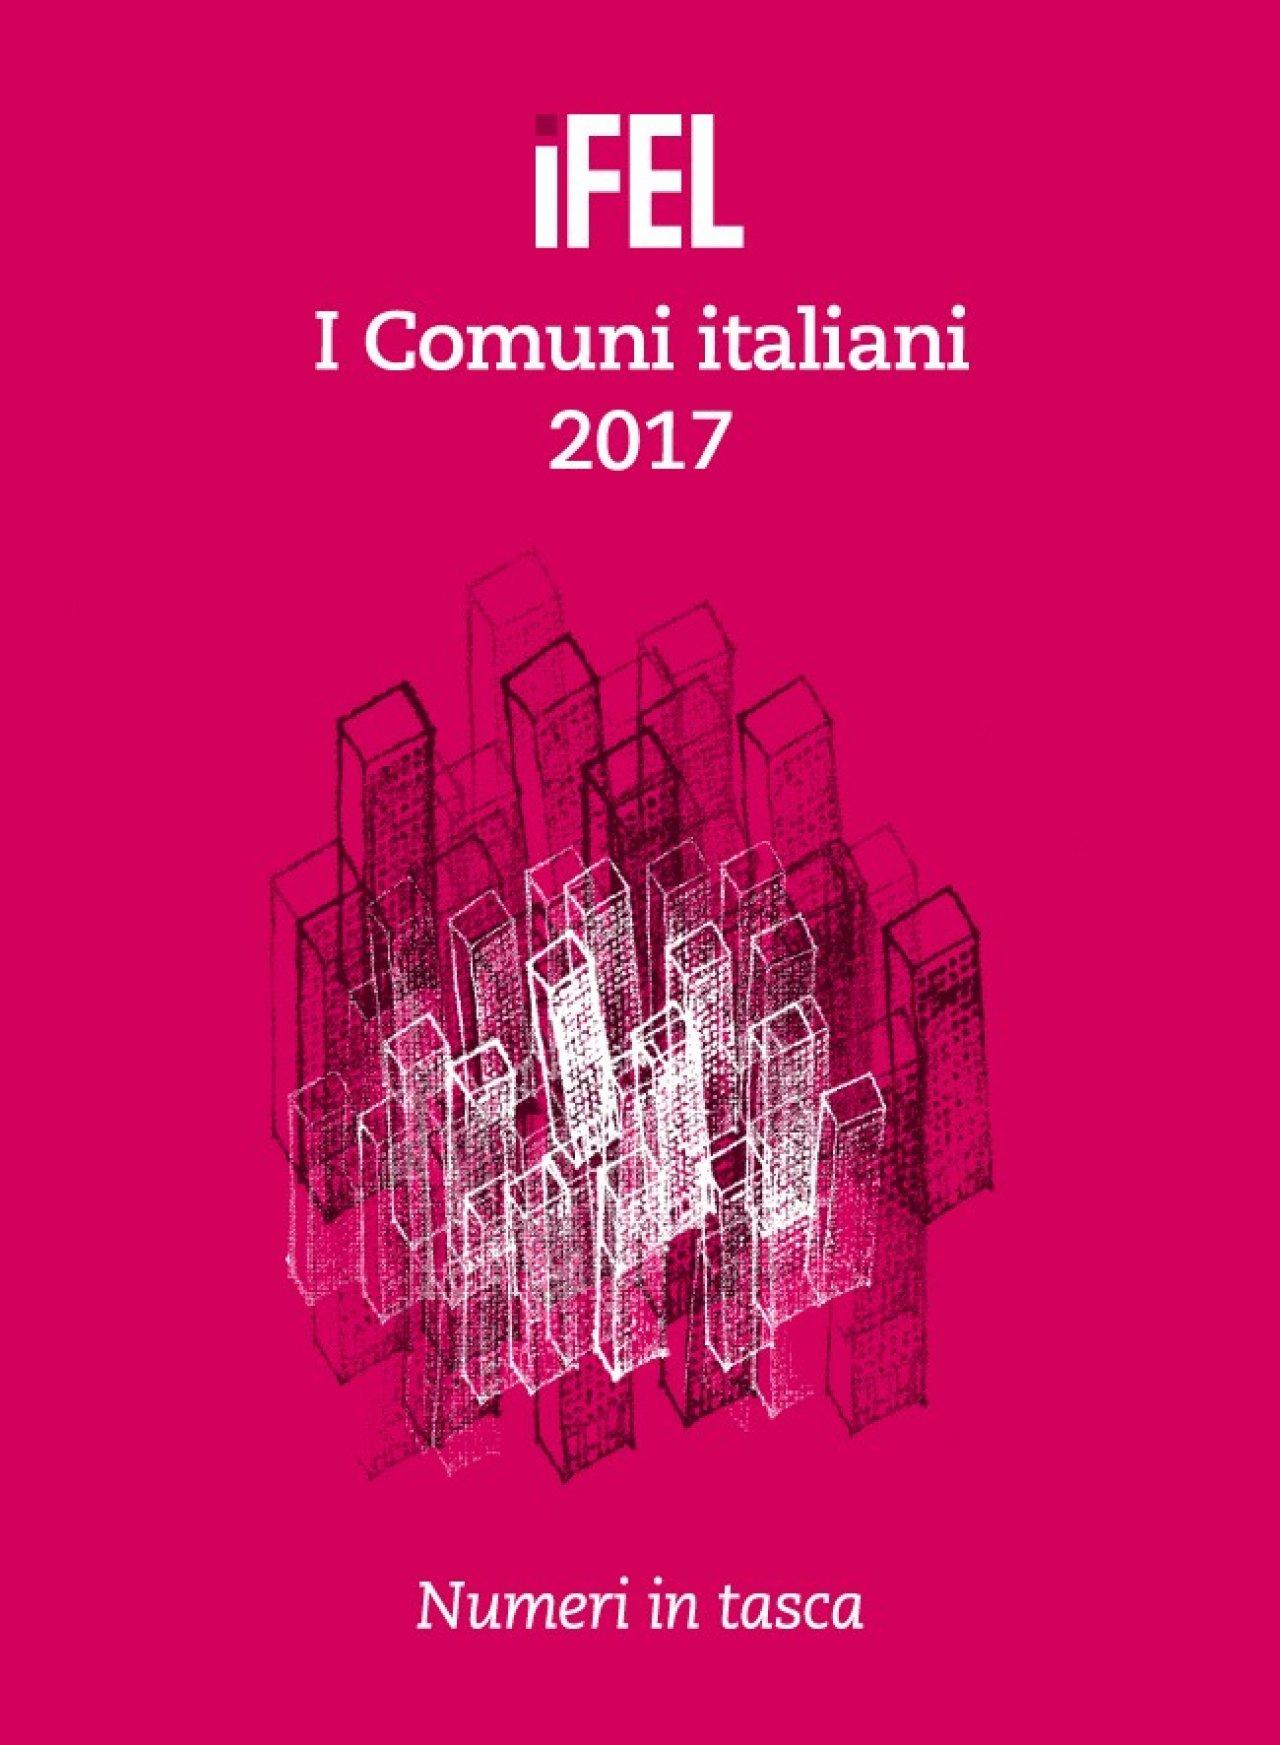 I Comuni italiani 2017 - Numeri in tasca